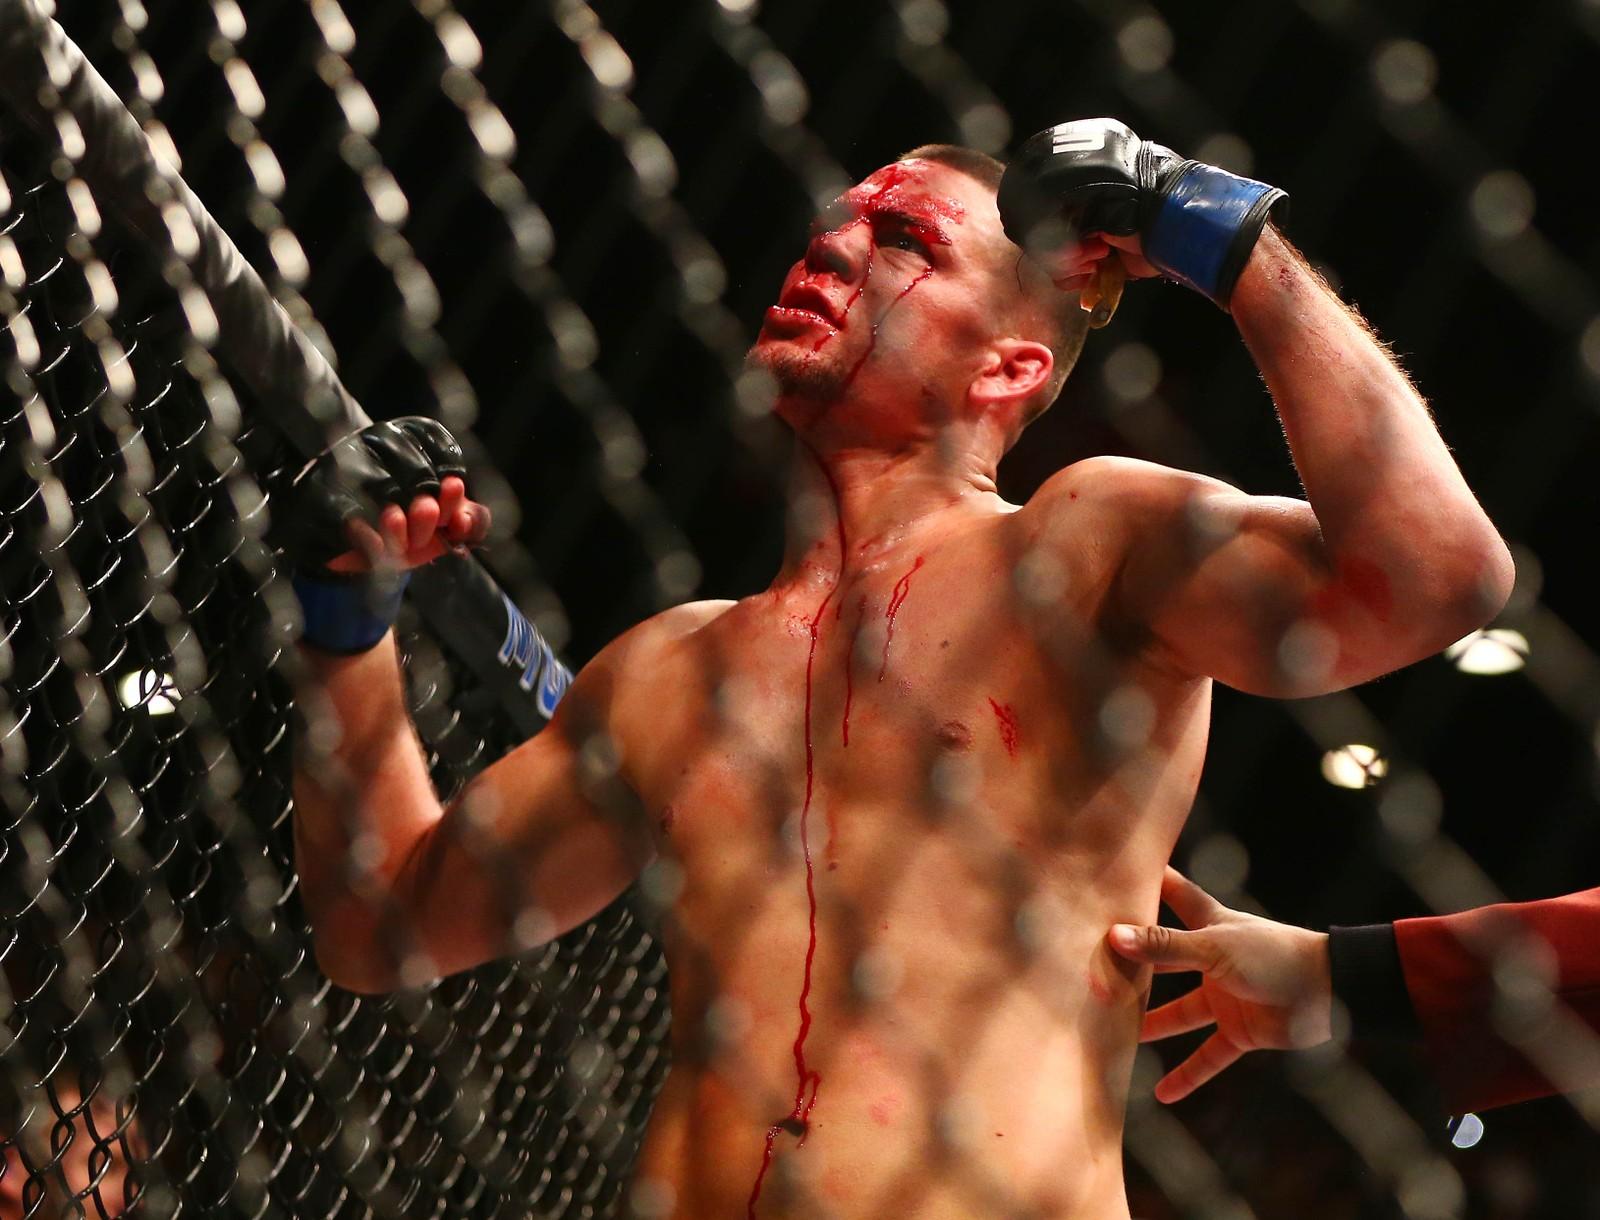 Her feirar Nate Diaz sigeren over Conor McGregor.